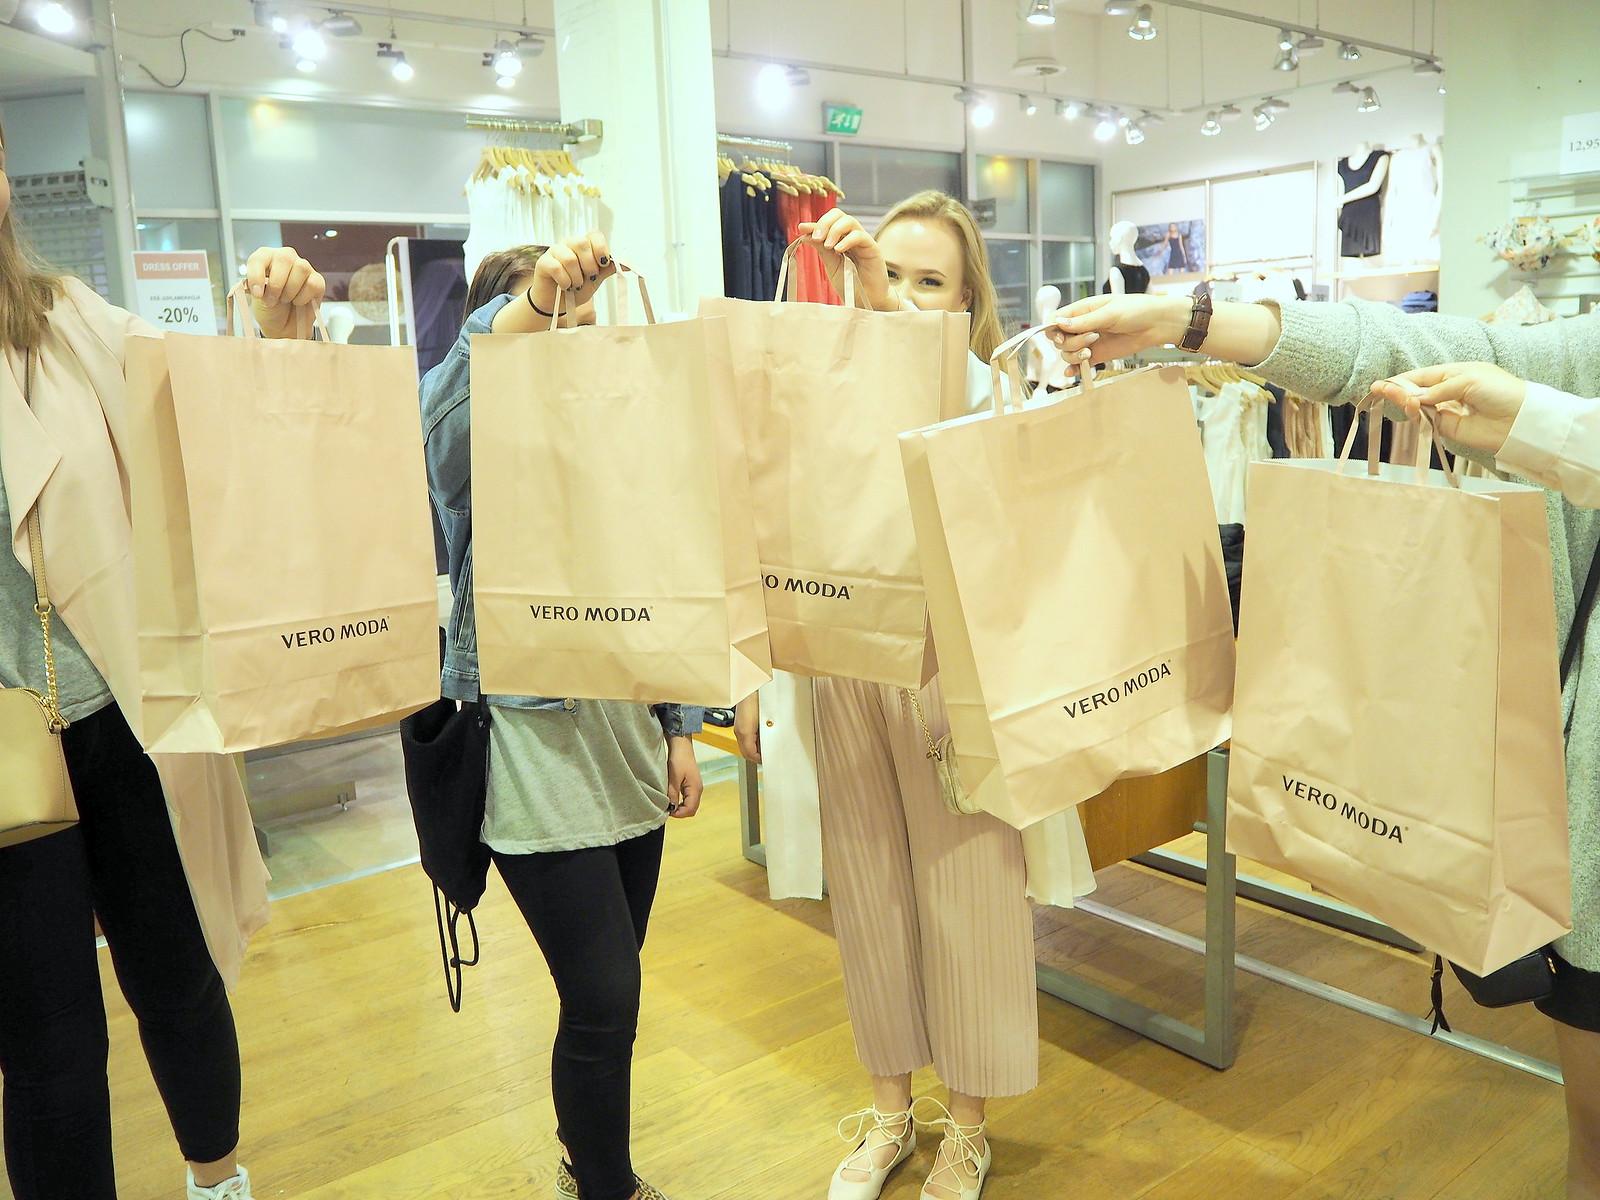 vero moda pirkkala shoppailuilta